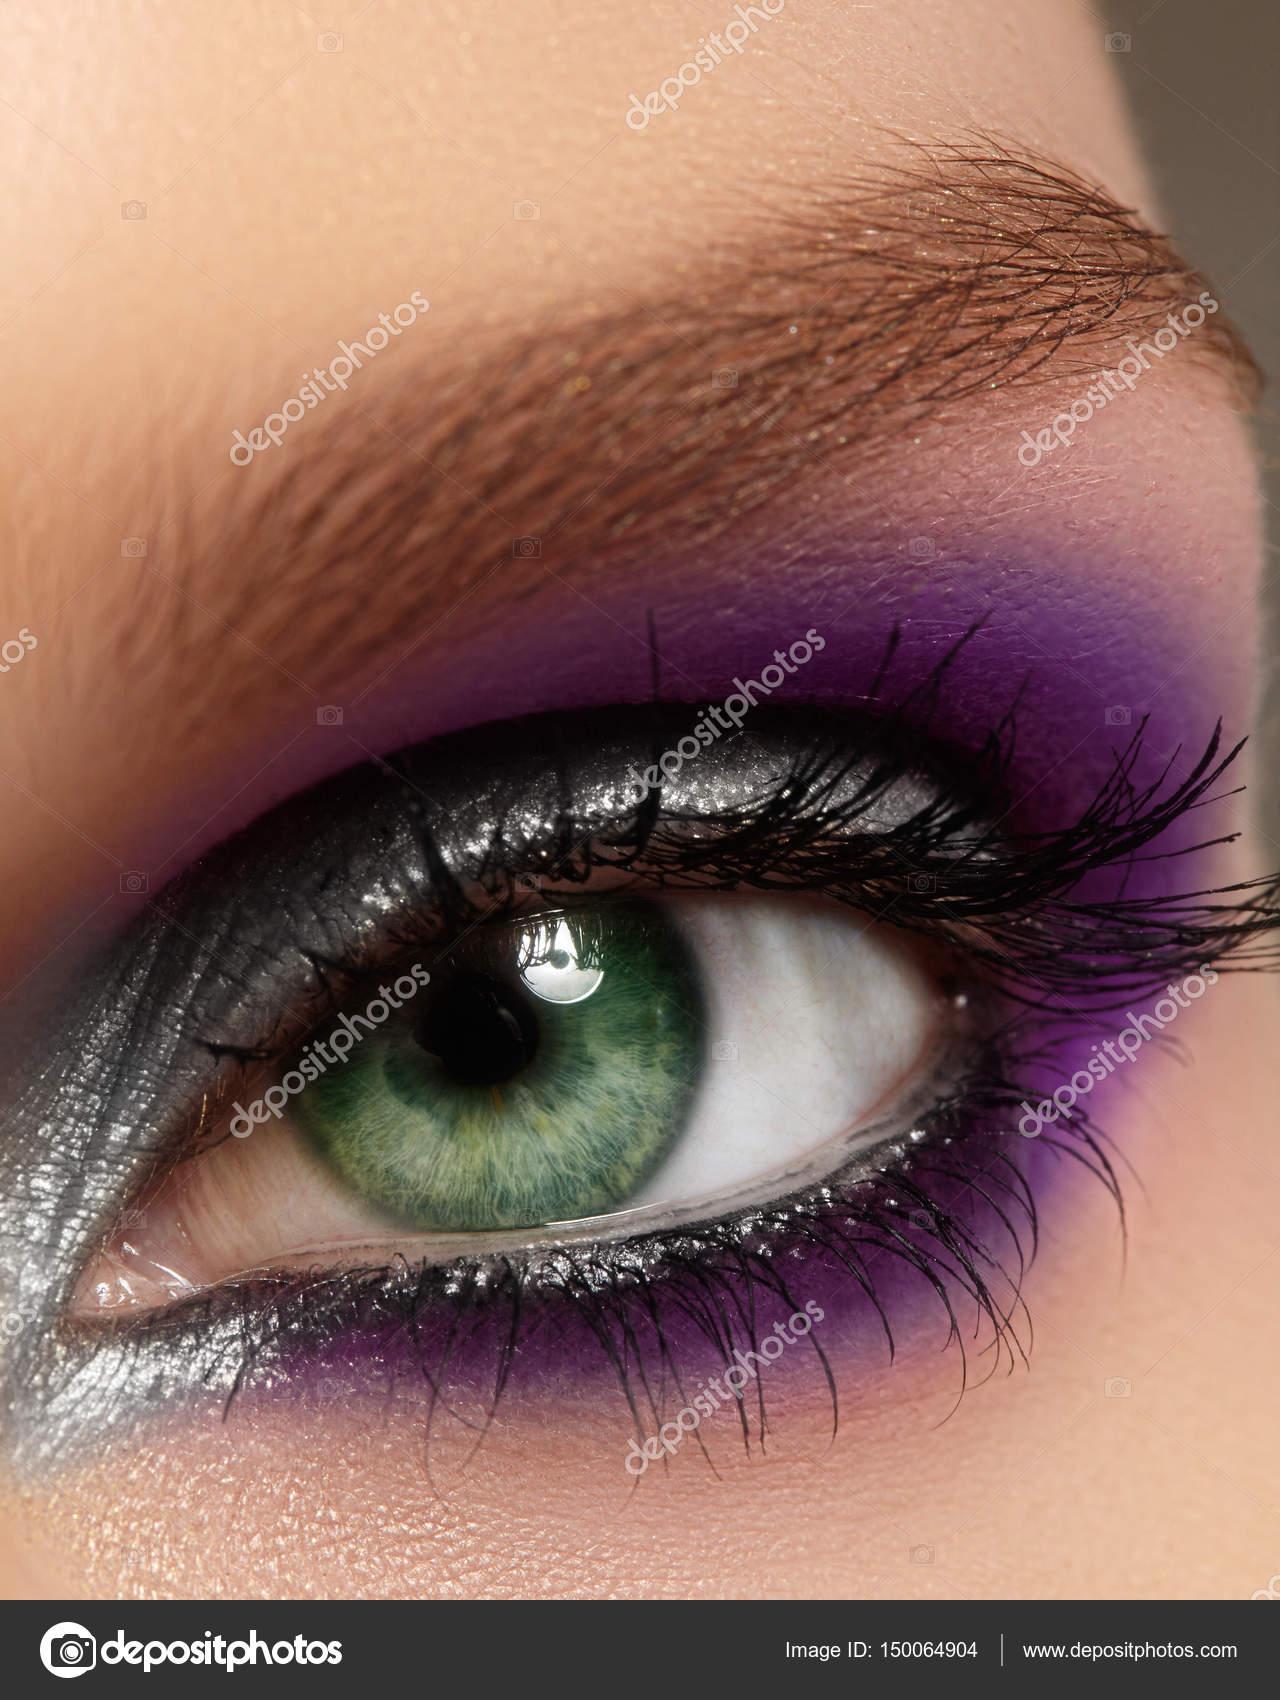 Makeup eye purple close up photo